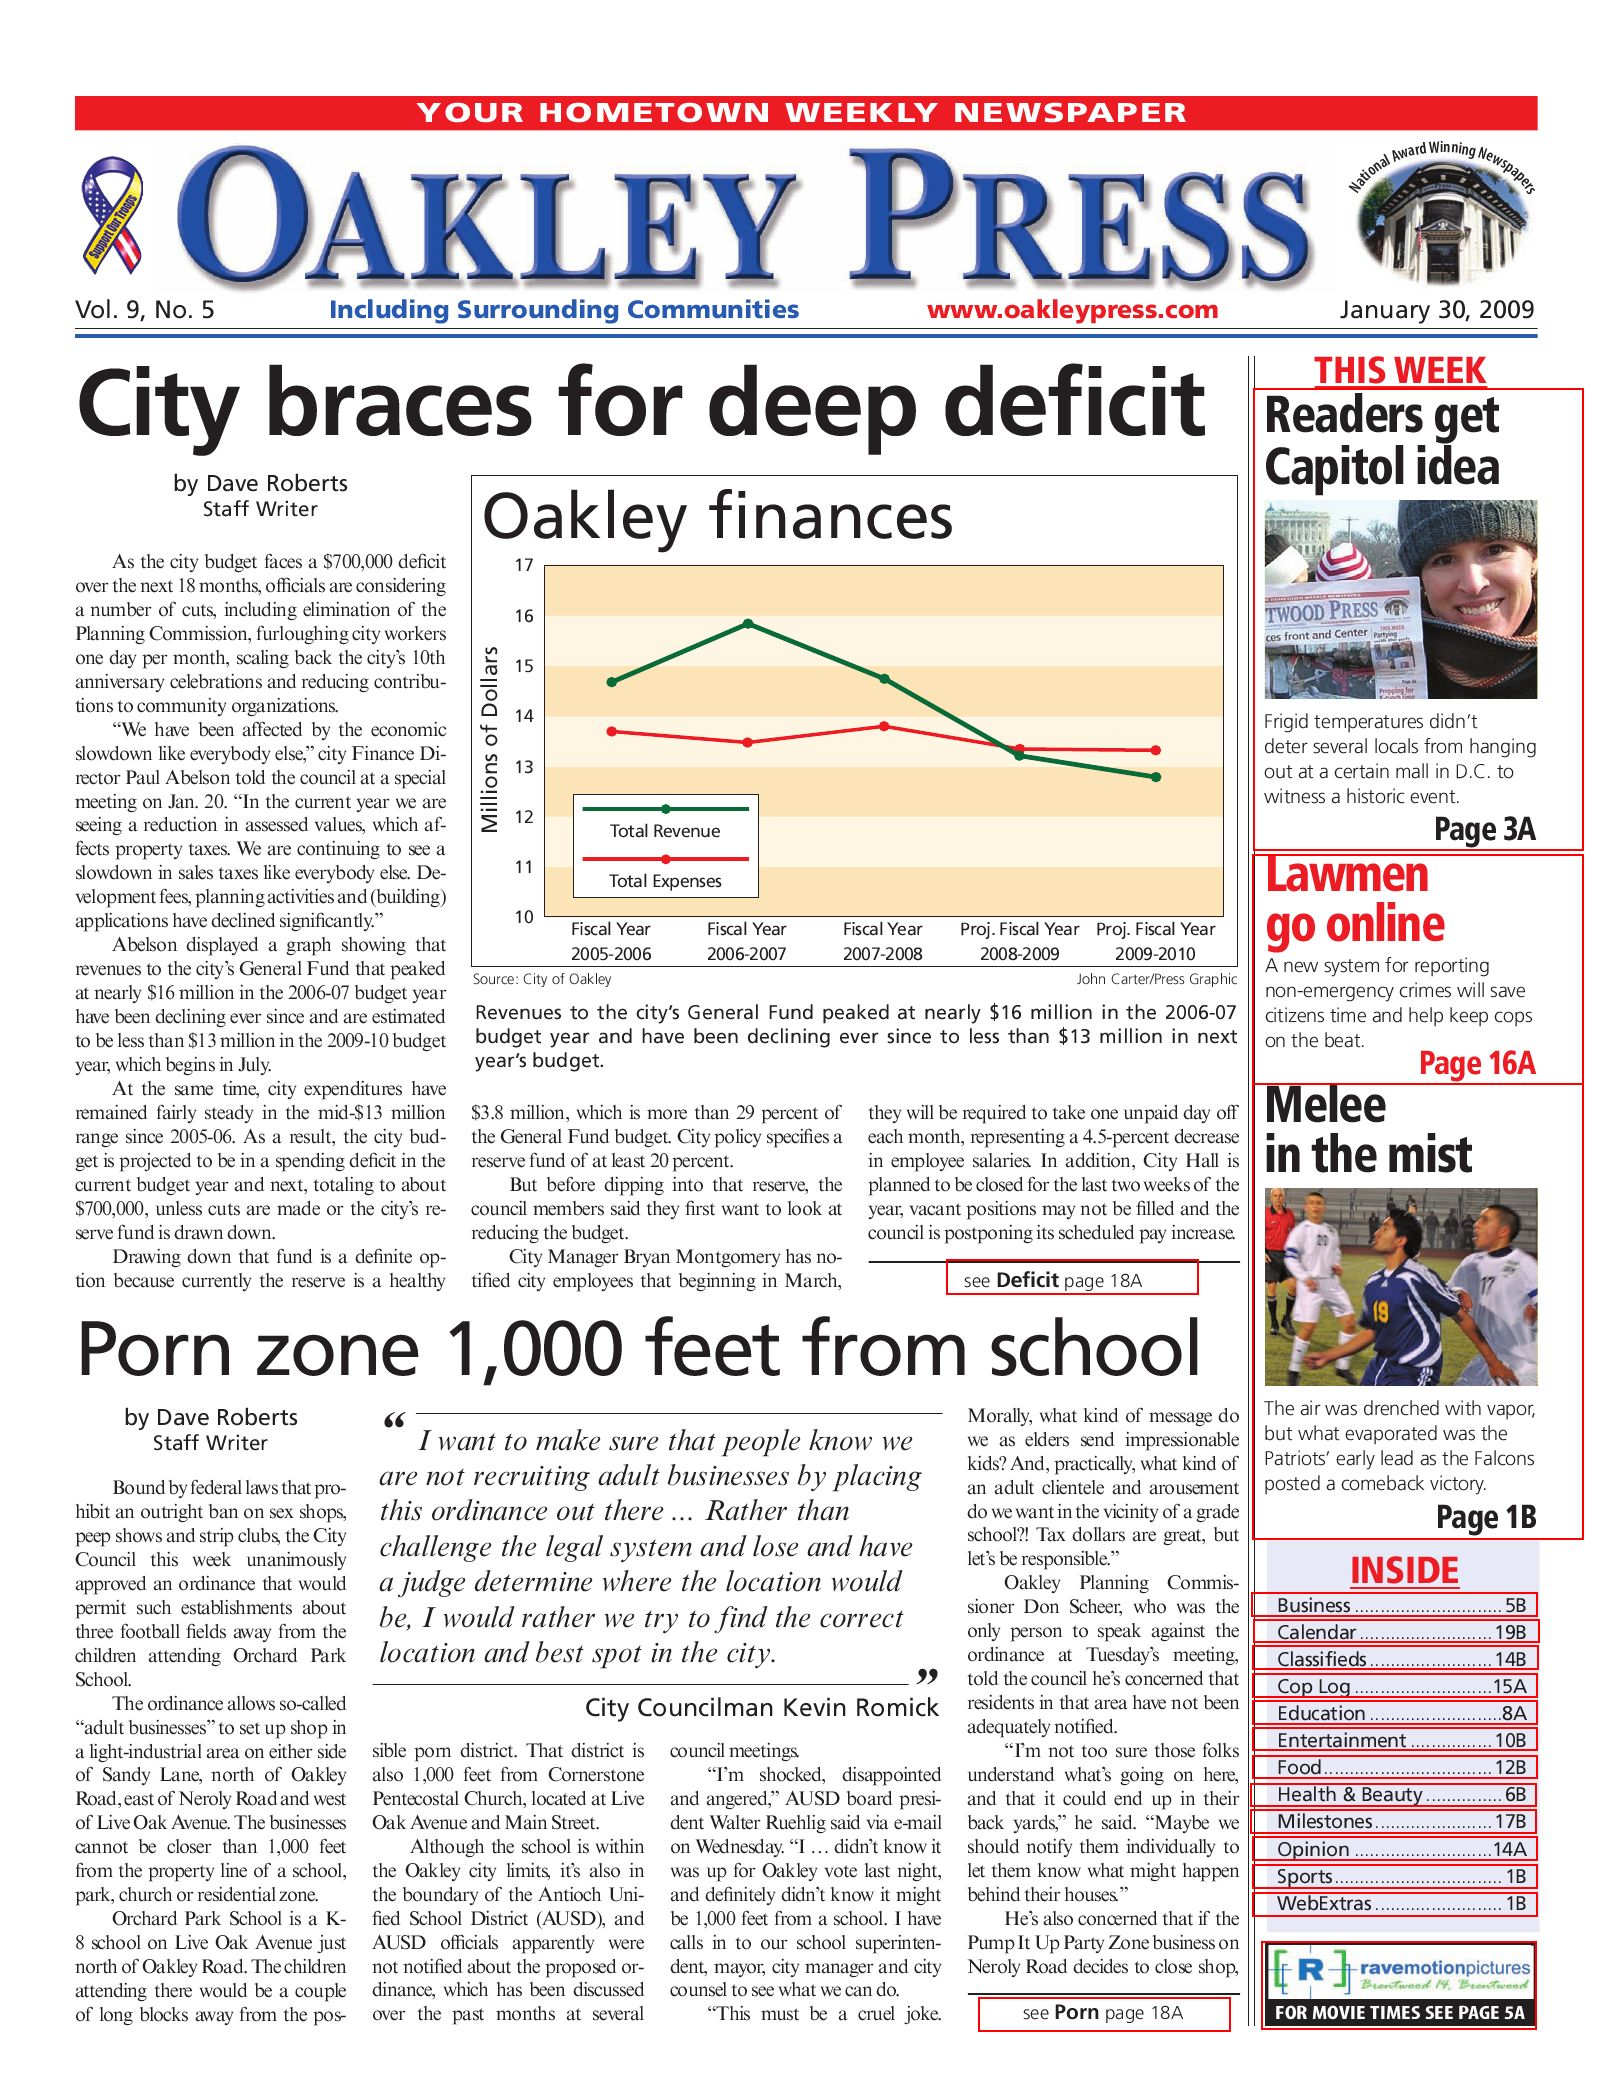 Oakley Press_1 30 09 by Brentwood Press & Publishing - issuu